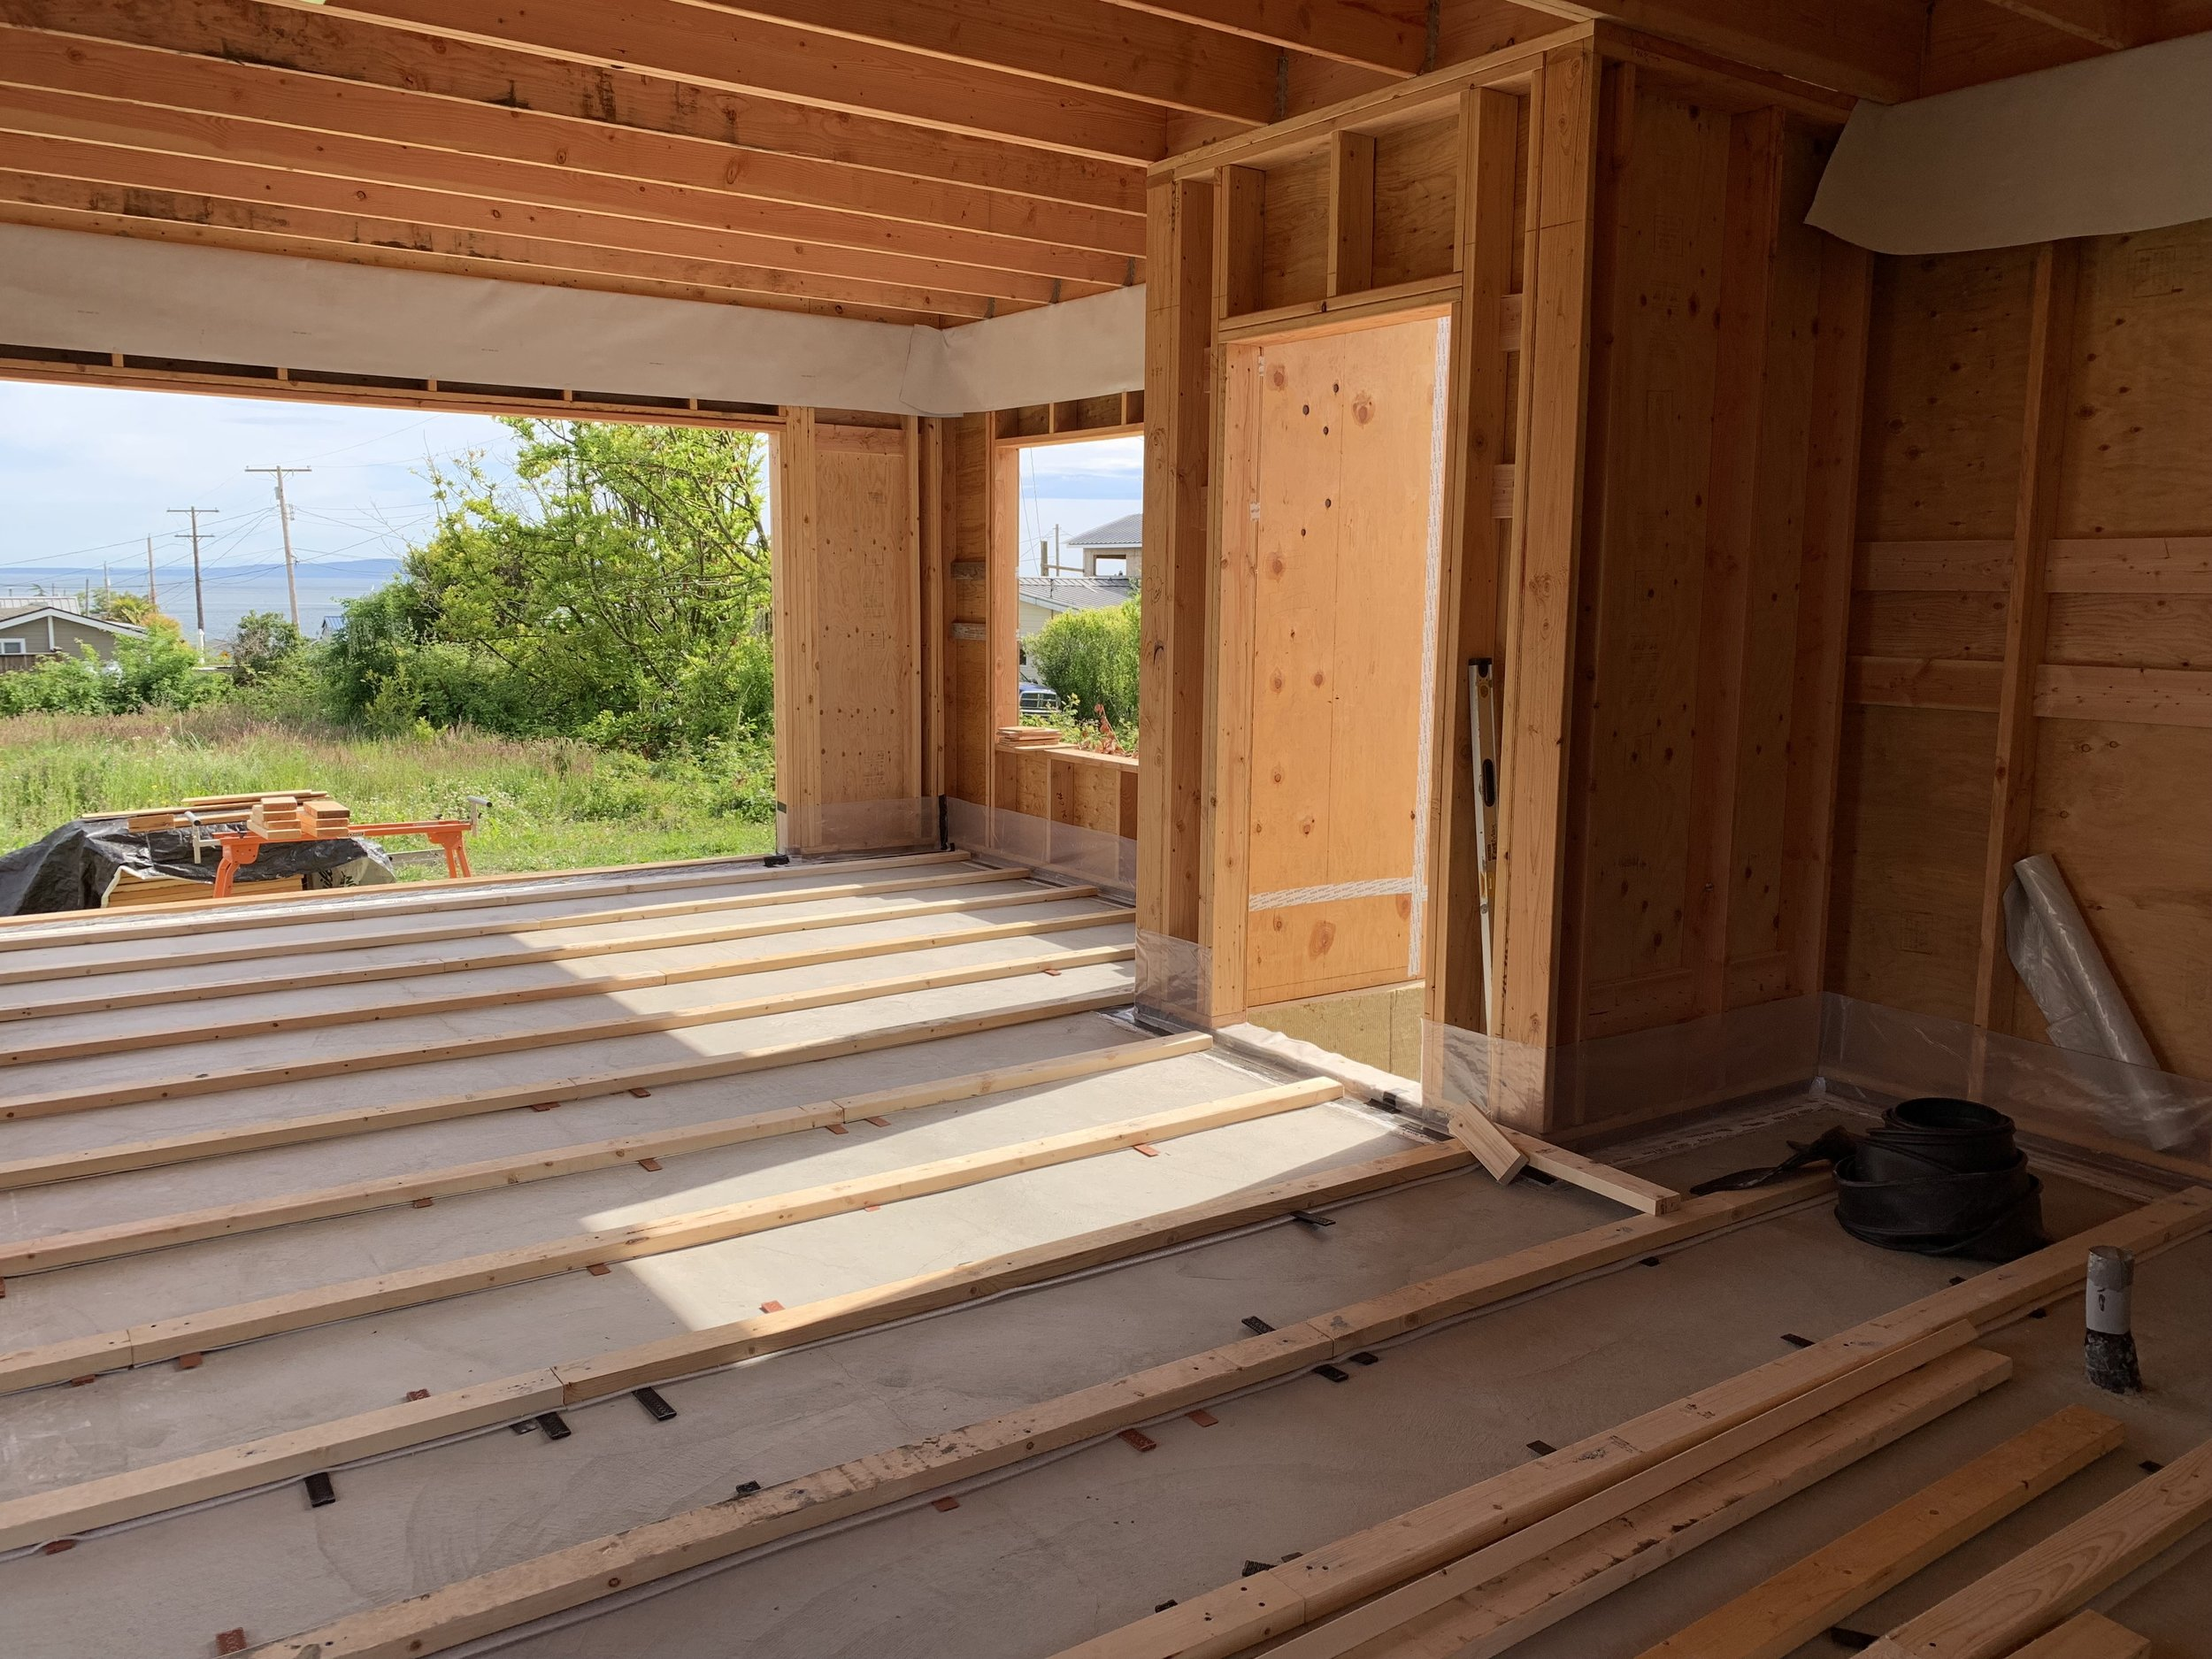 Sleeper sub-floor for a wood-over-concrete floor